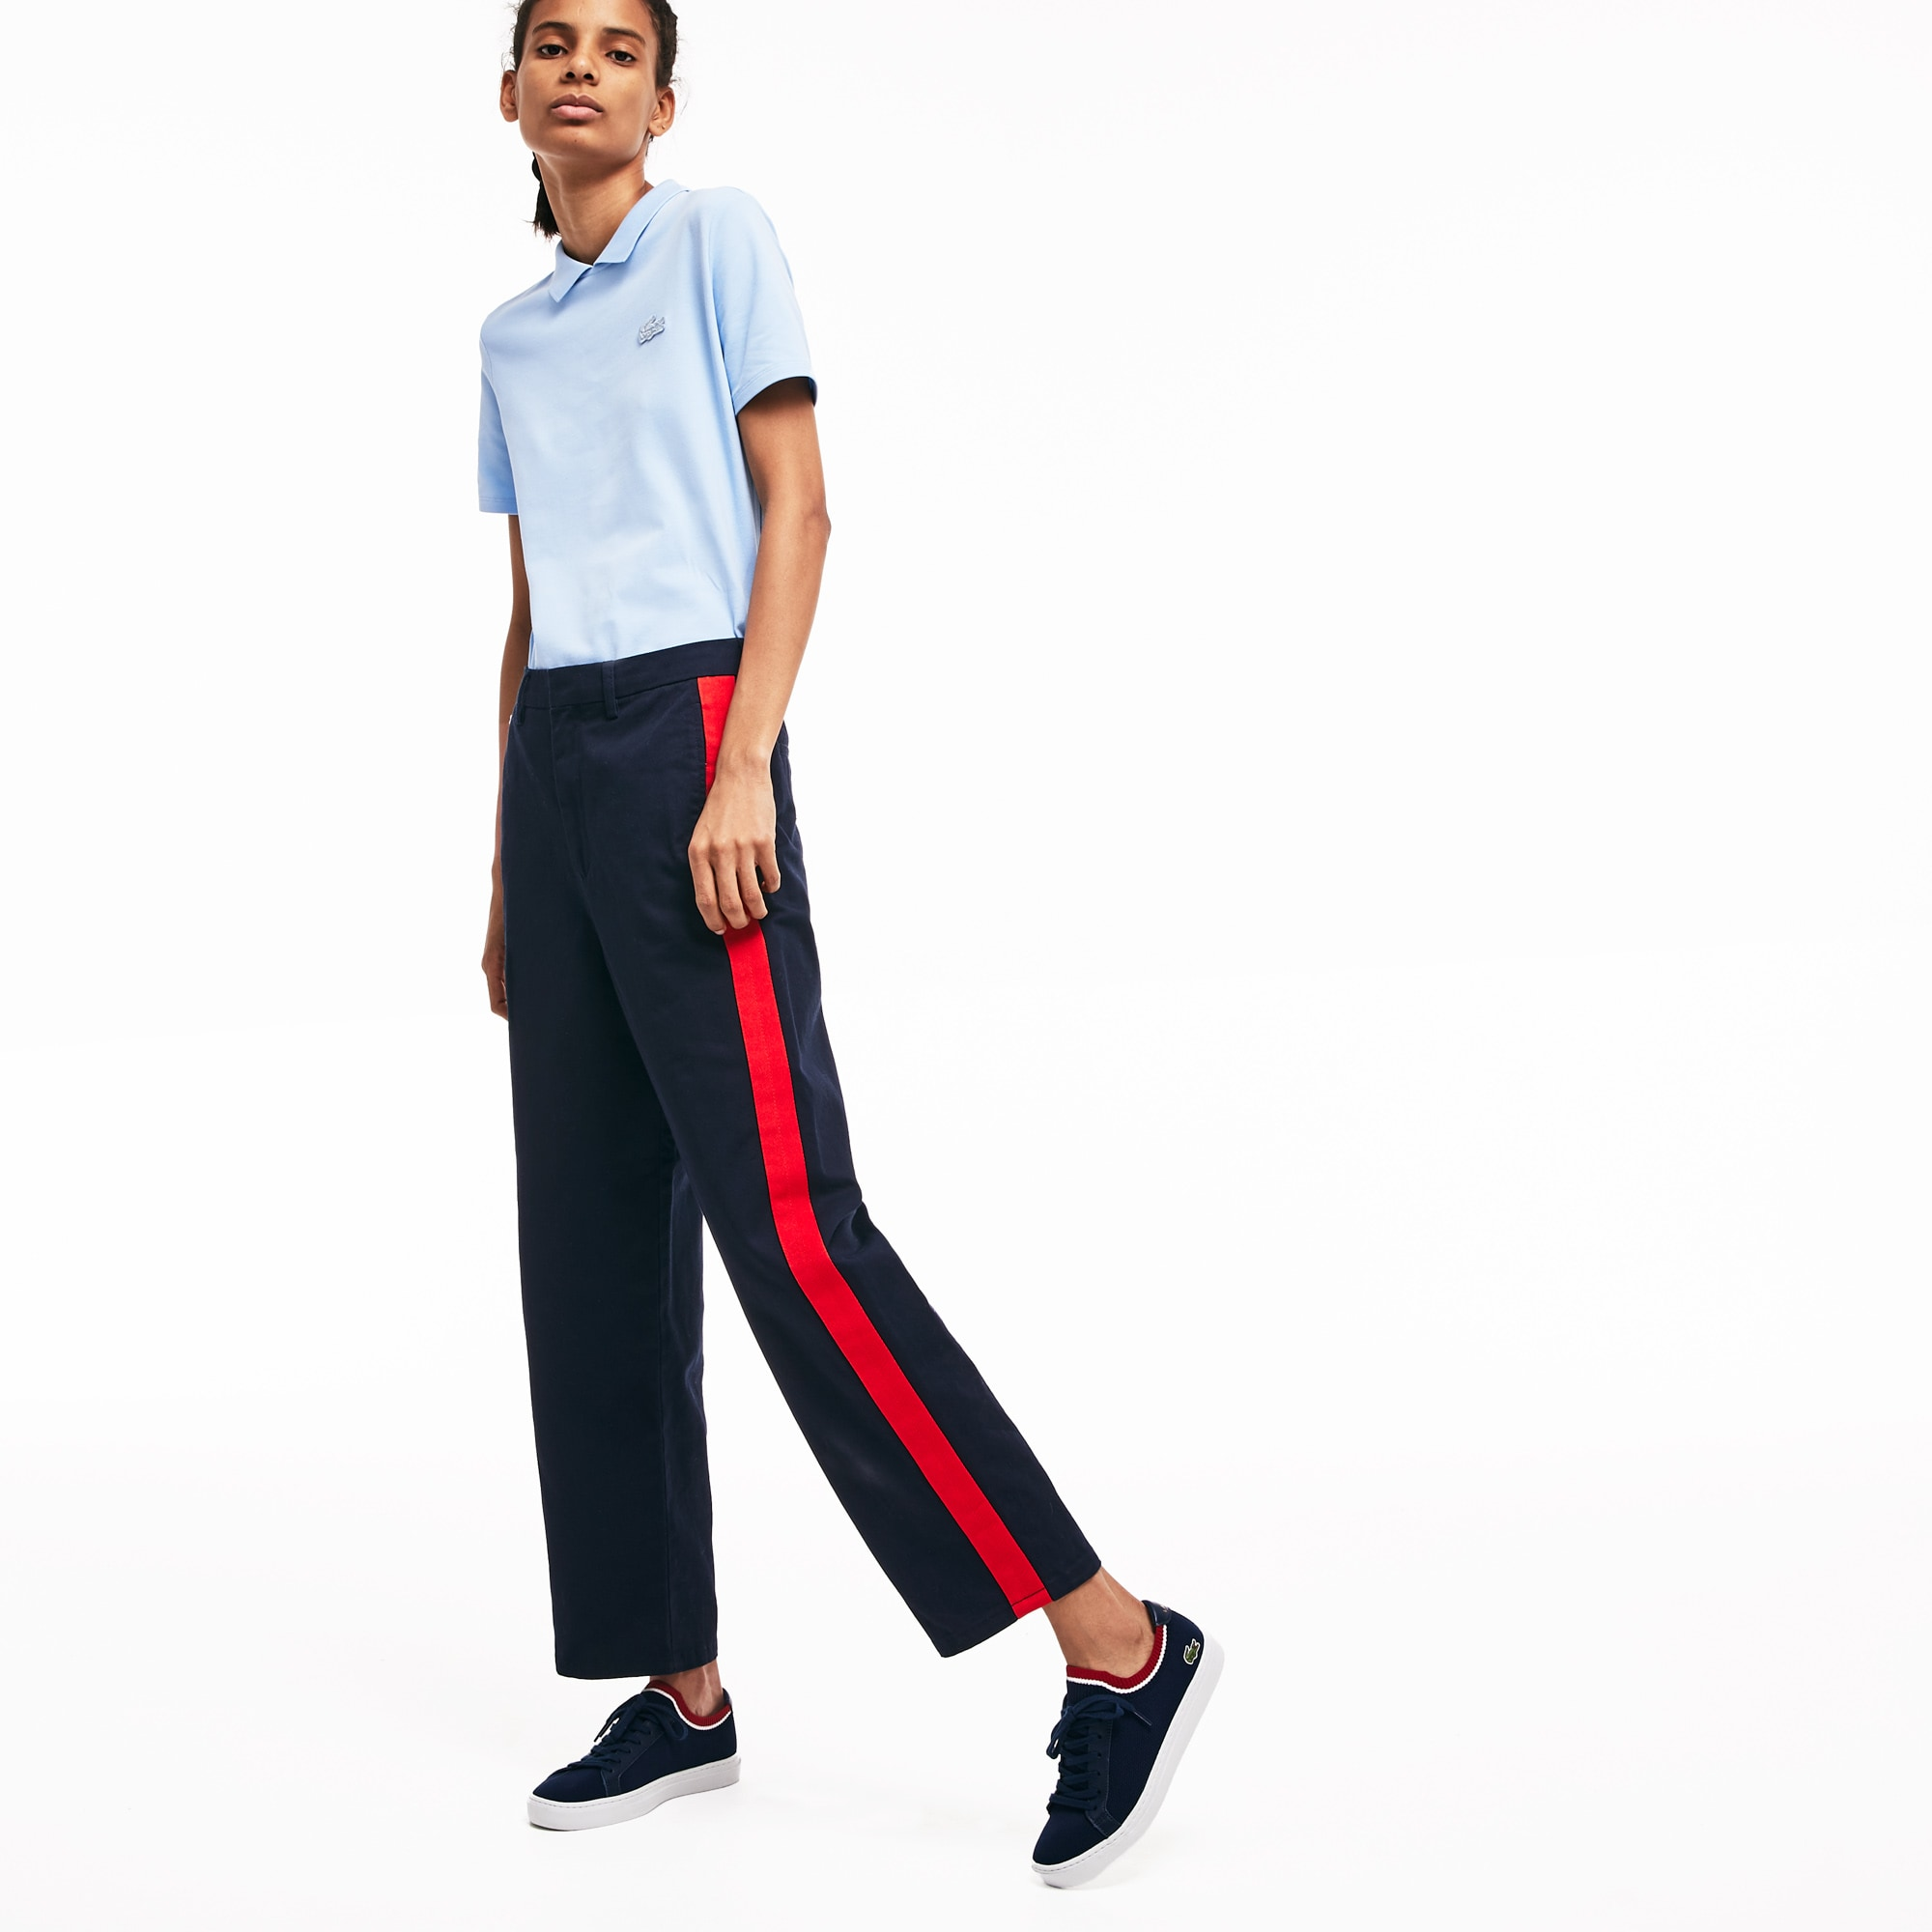 2ba316cbc7 Trousers & Shorts   Women's Fashion   LACOSTE LIVE